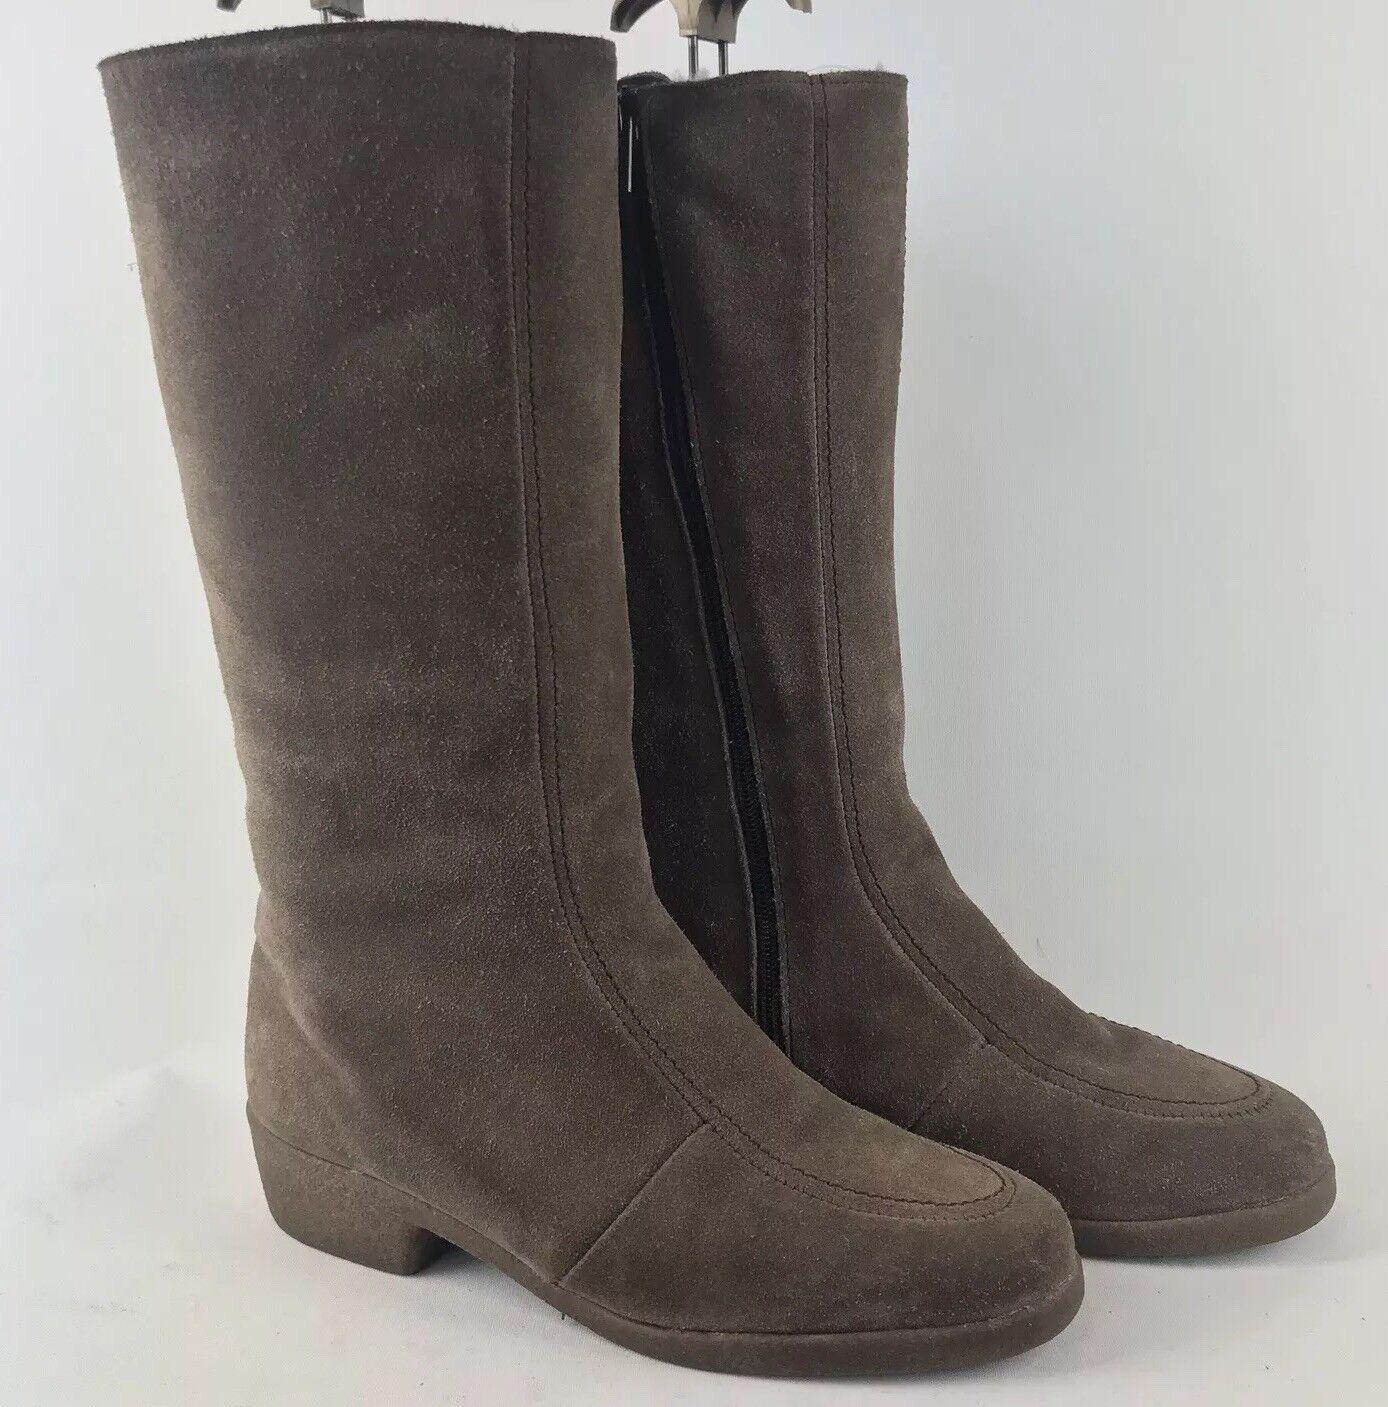 MOORLANDS Größe UK 6D Sheepskin Calf High Stiefel    | Spaß